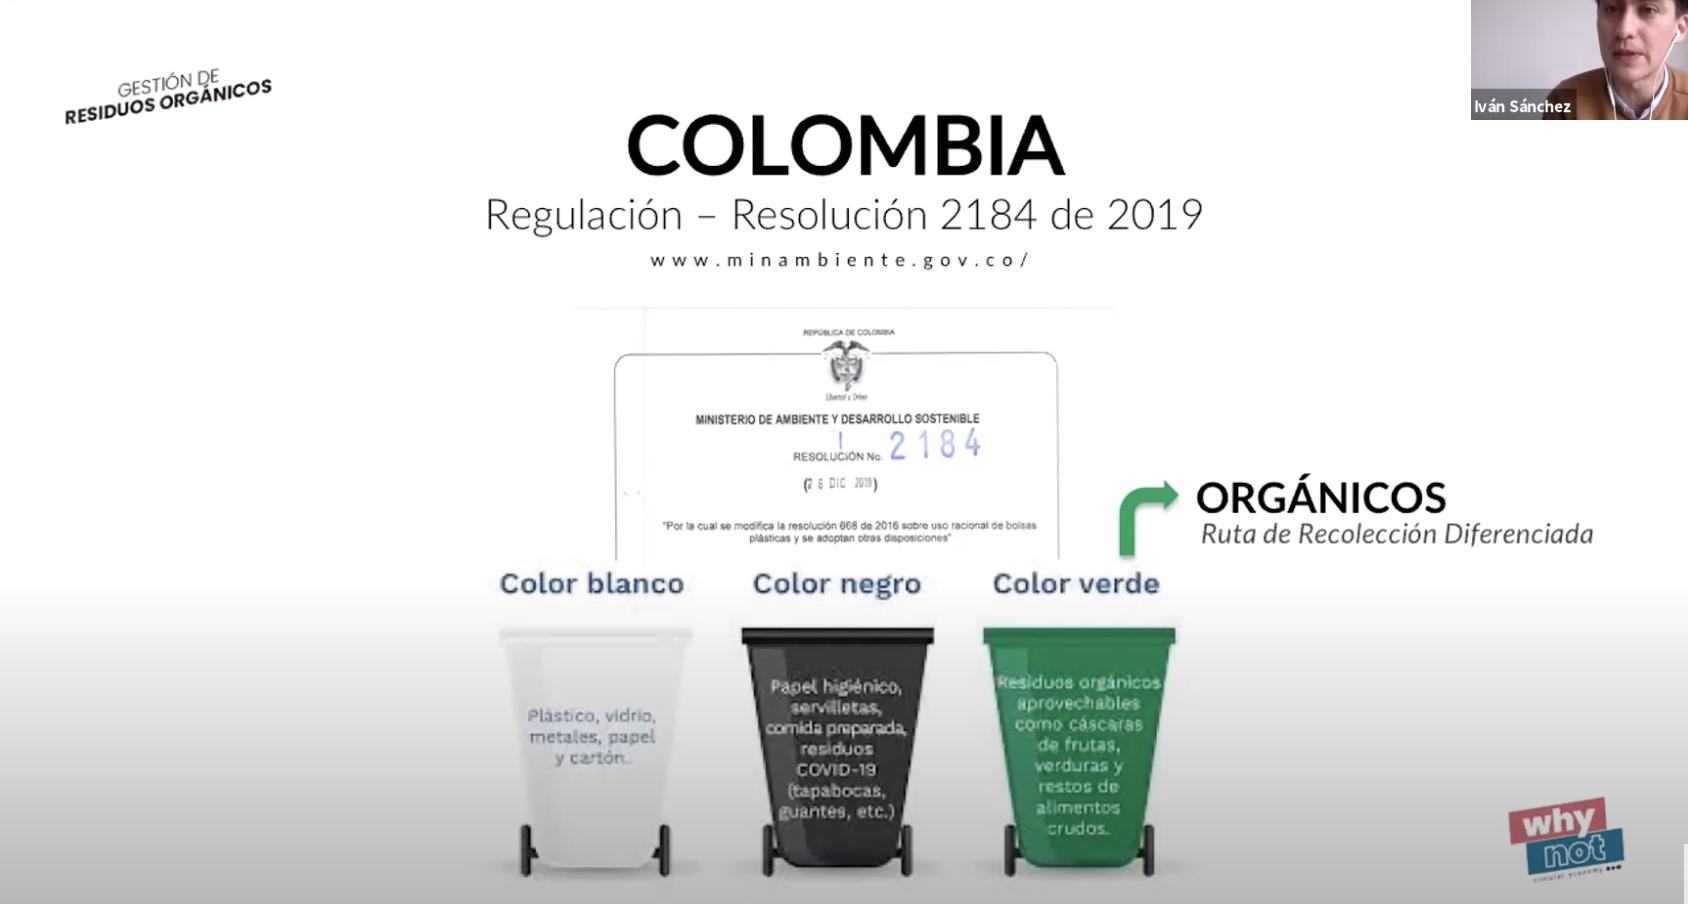 Organic Waste Management in Latin America